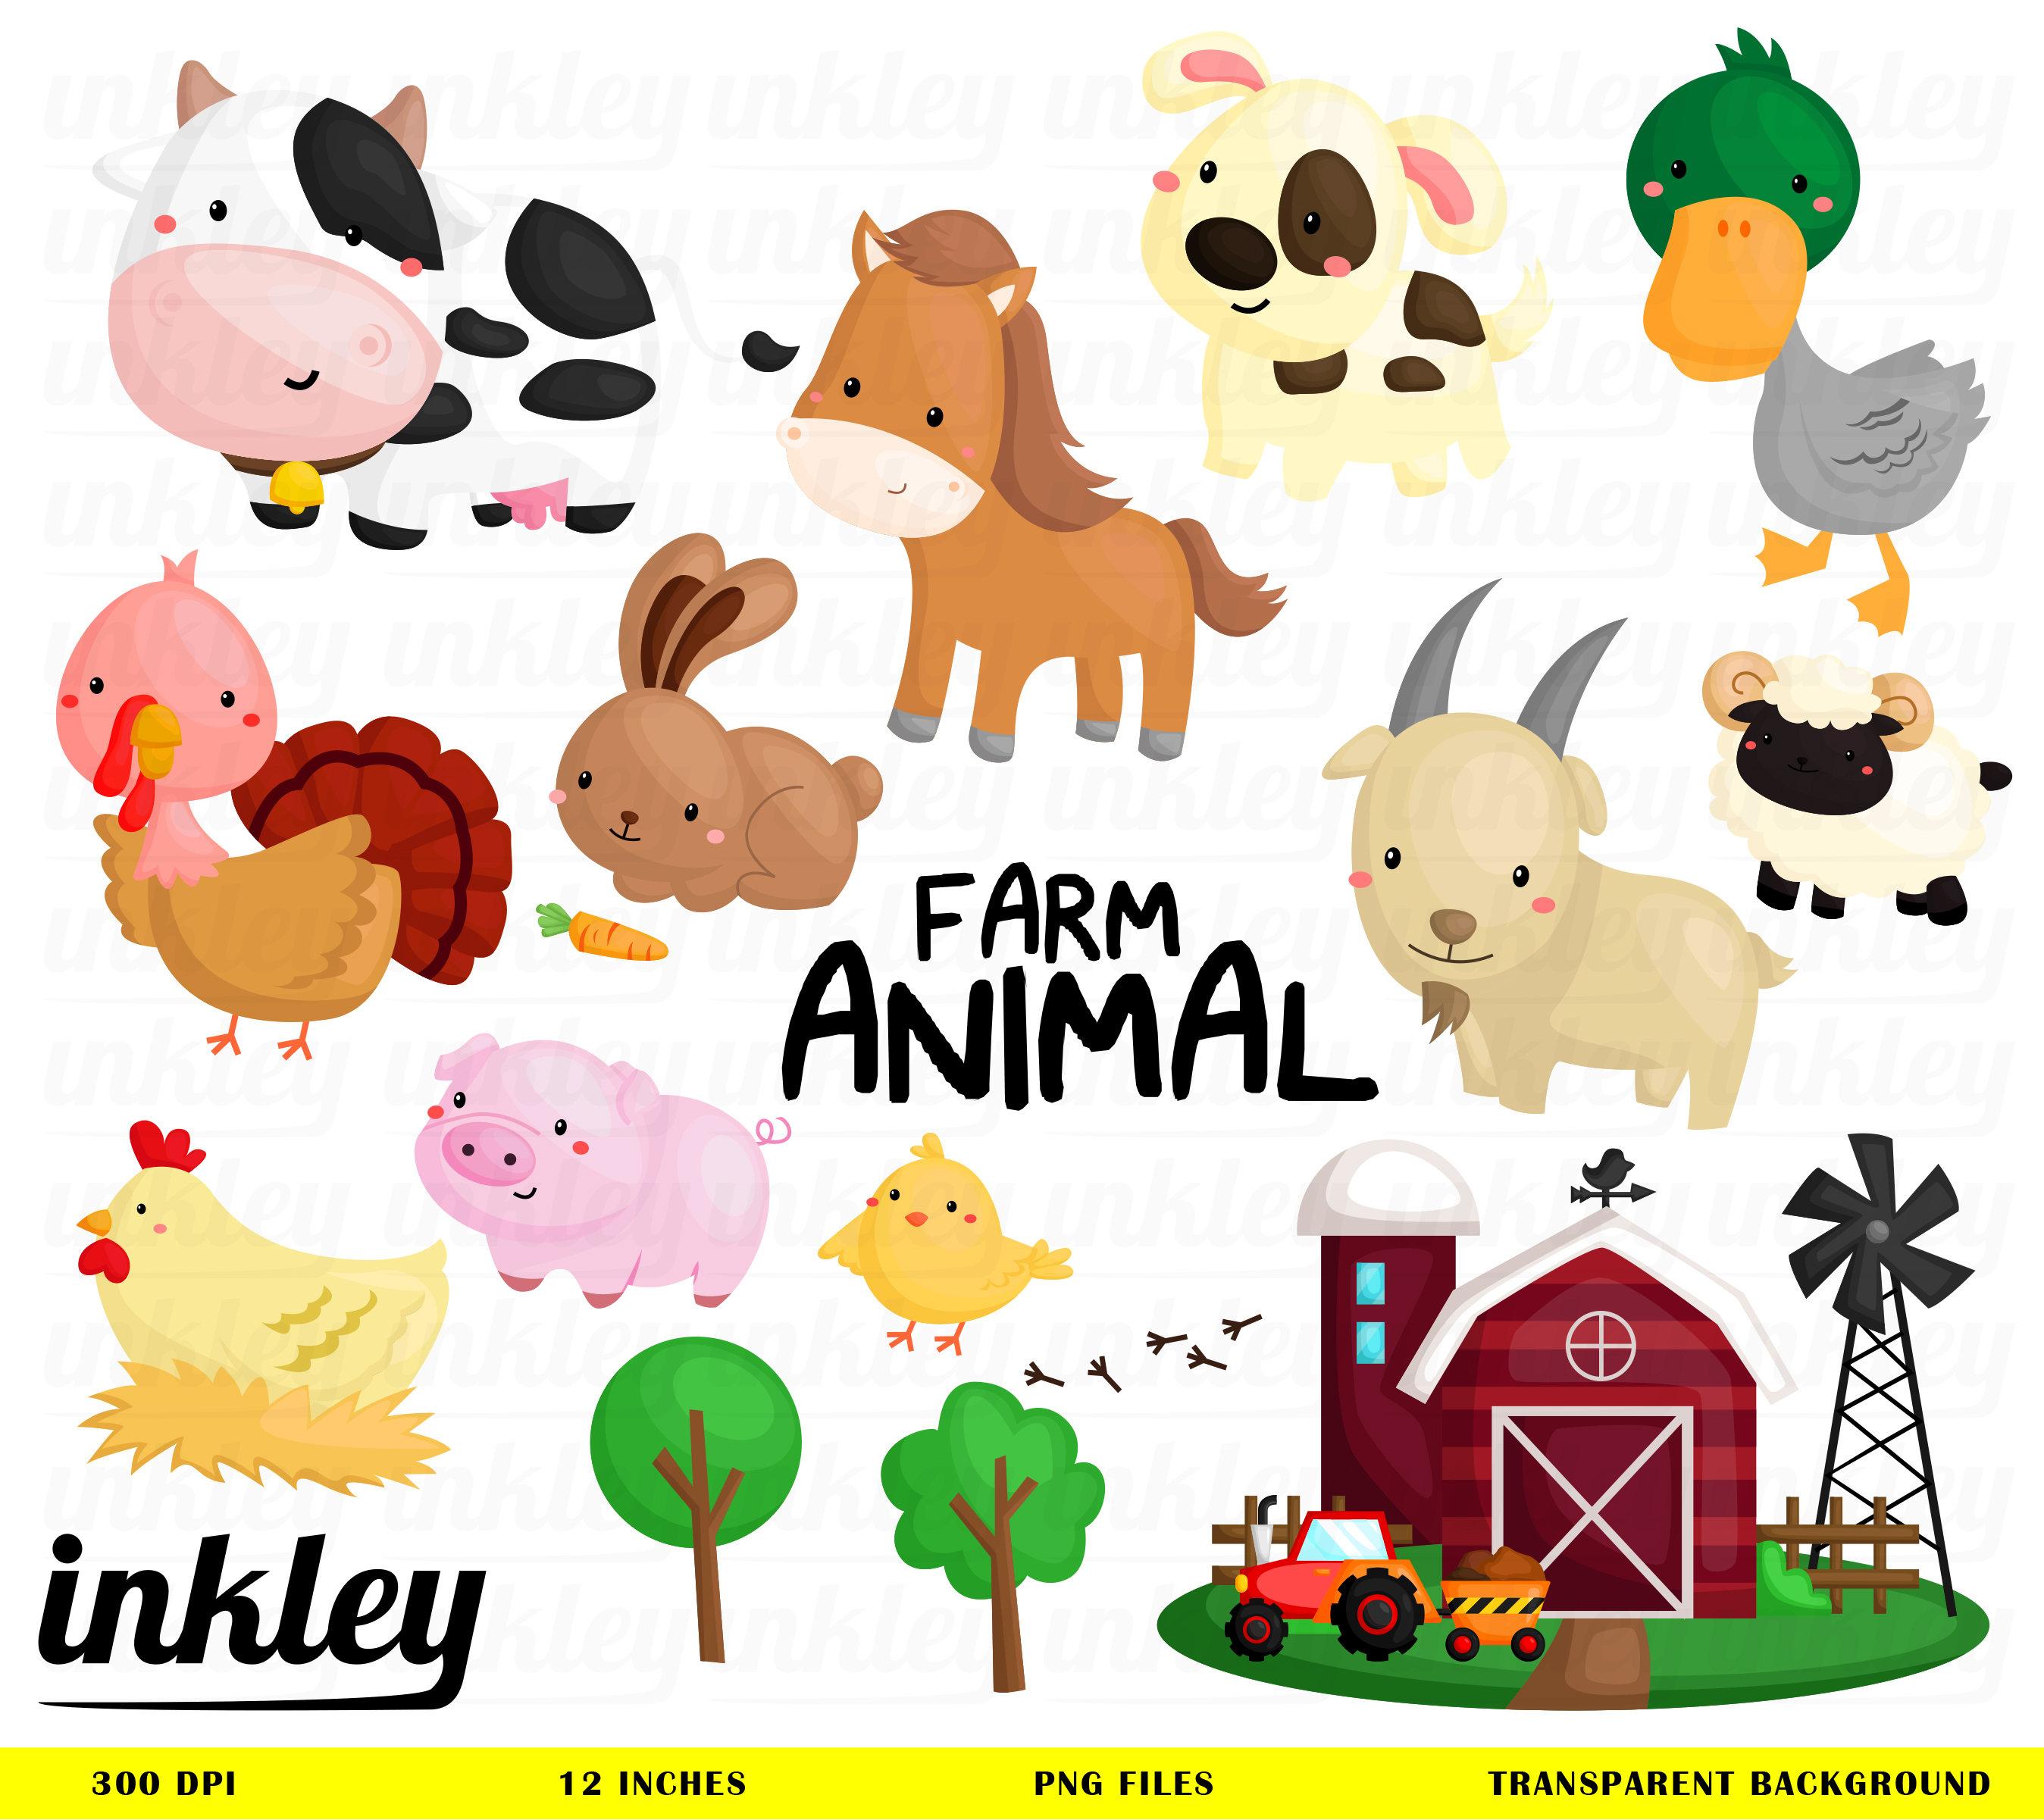 farm animal clipart farm animal clip art farm animal png rh etsy com farm animals clip art pictures farm animals clipart for kids